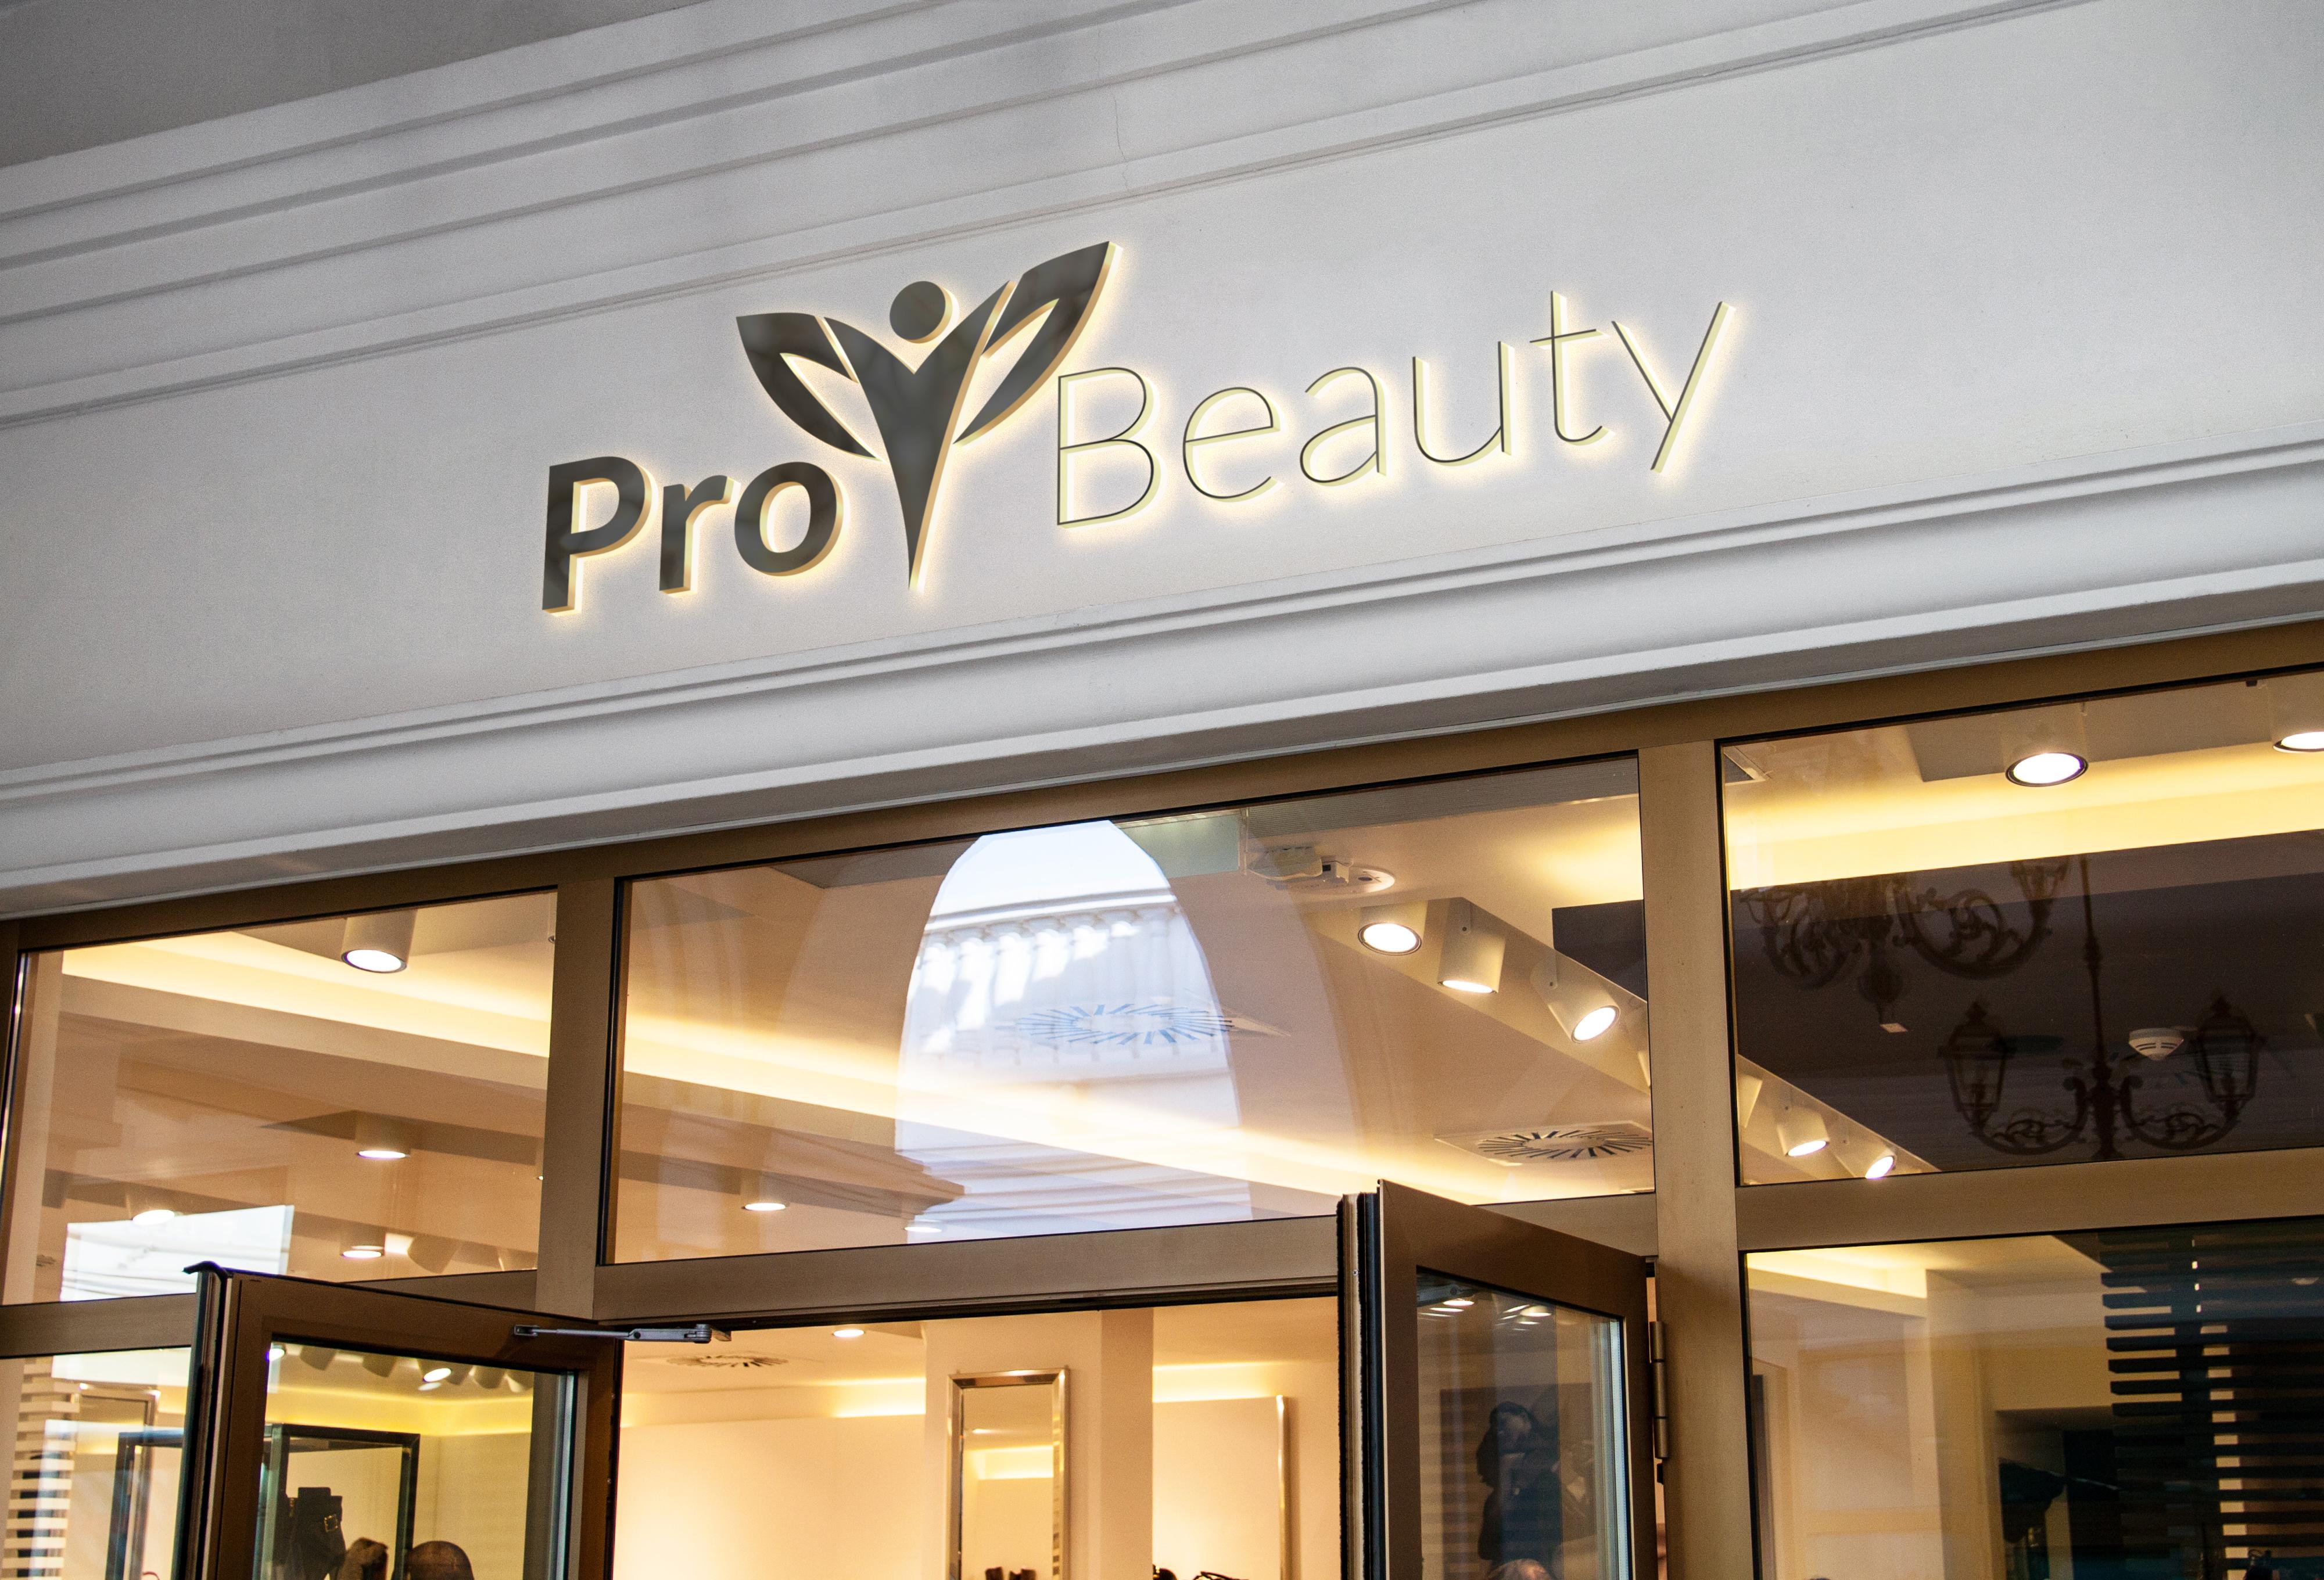 I will Professional creative business logo Design